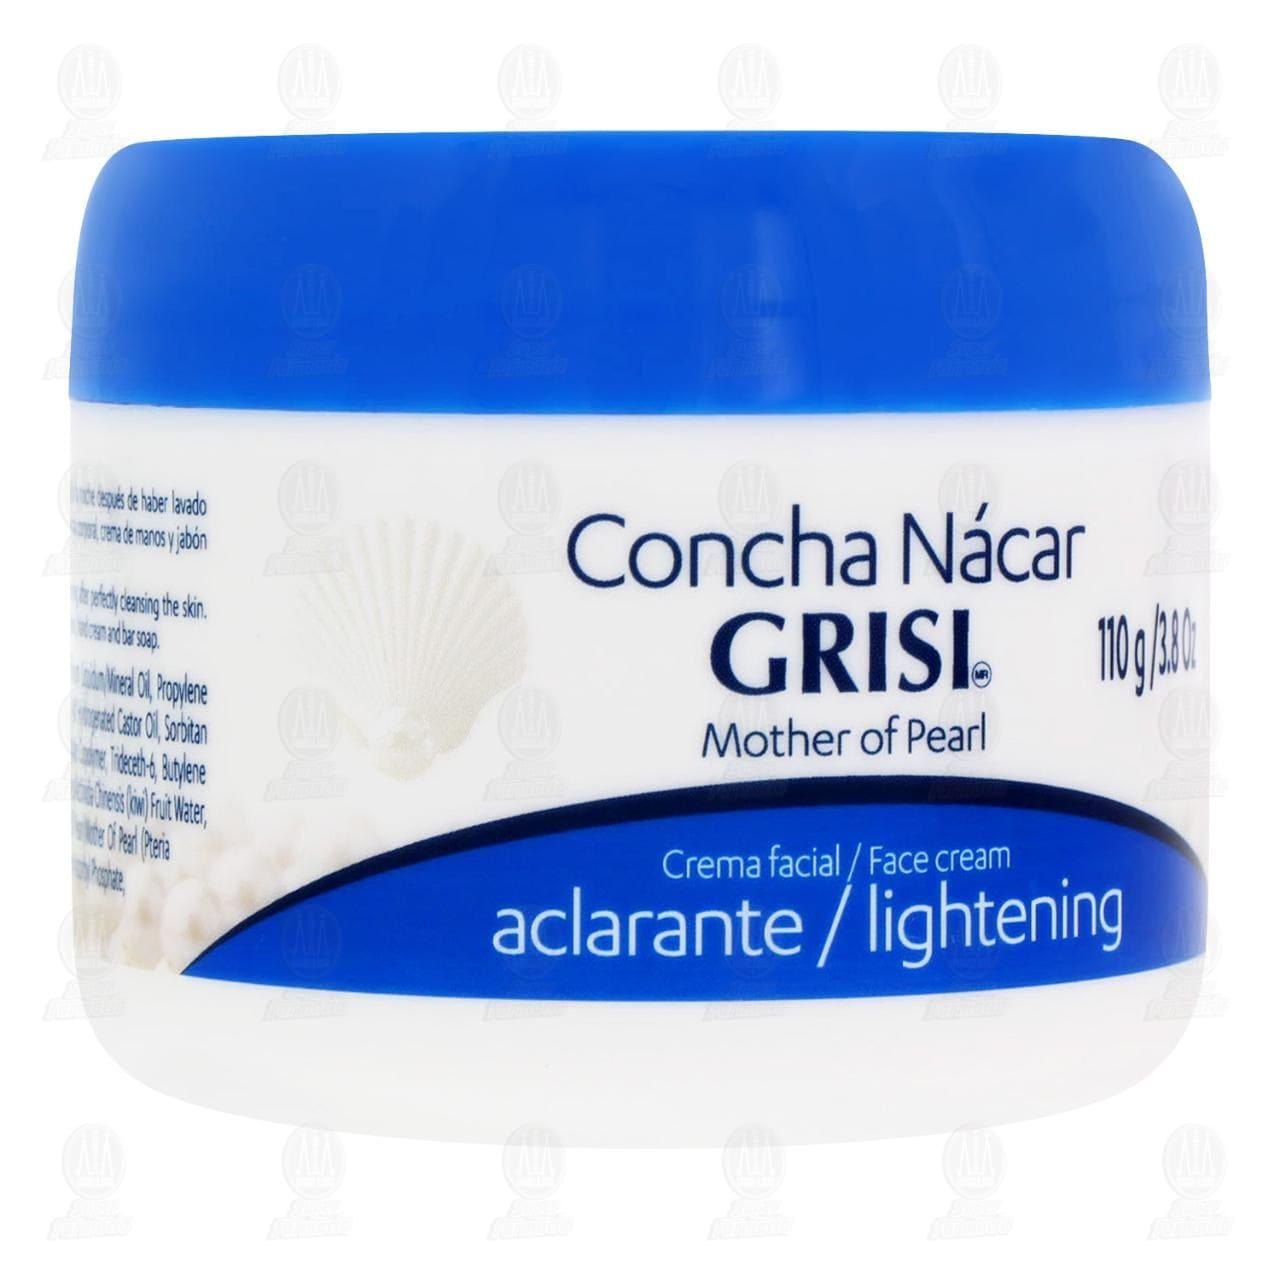 Crema Aclarante Concha Nácar Grisi para Rostro, 2 pzas.